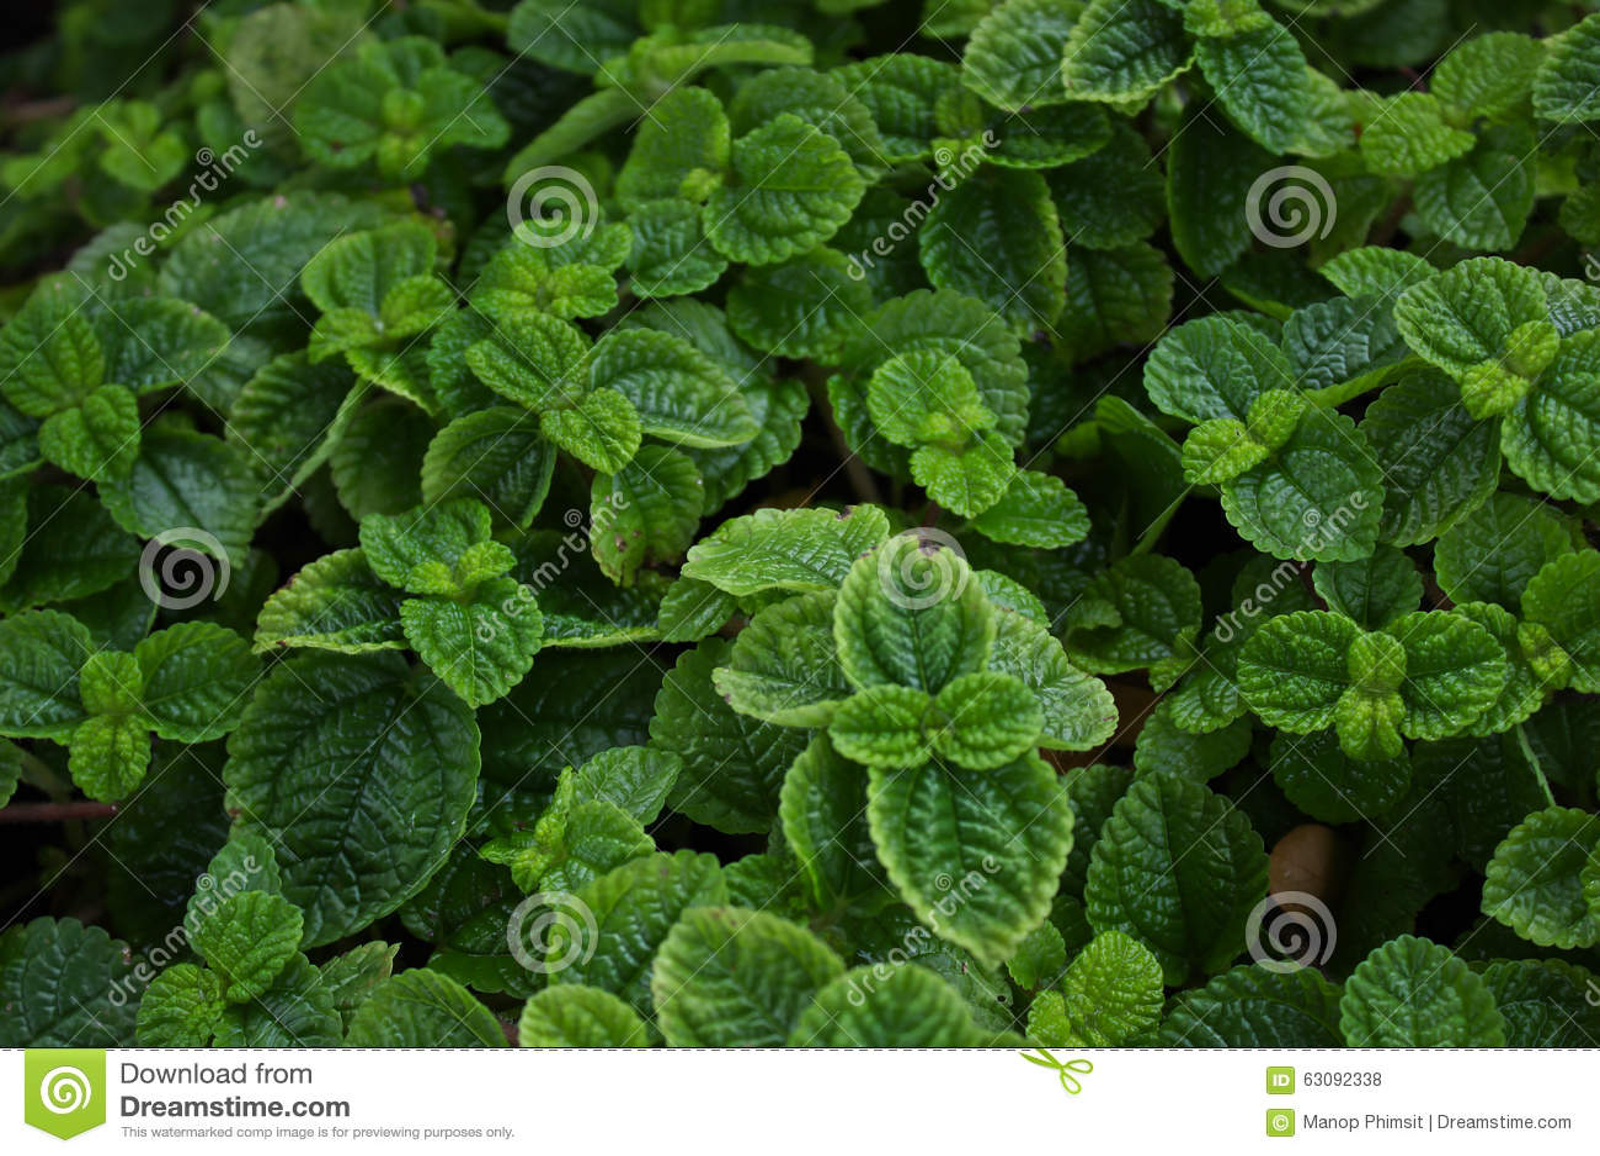 Download Monnayages photo stock. Image du nourriture, herbe, jardin - 63092338